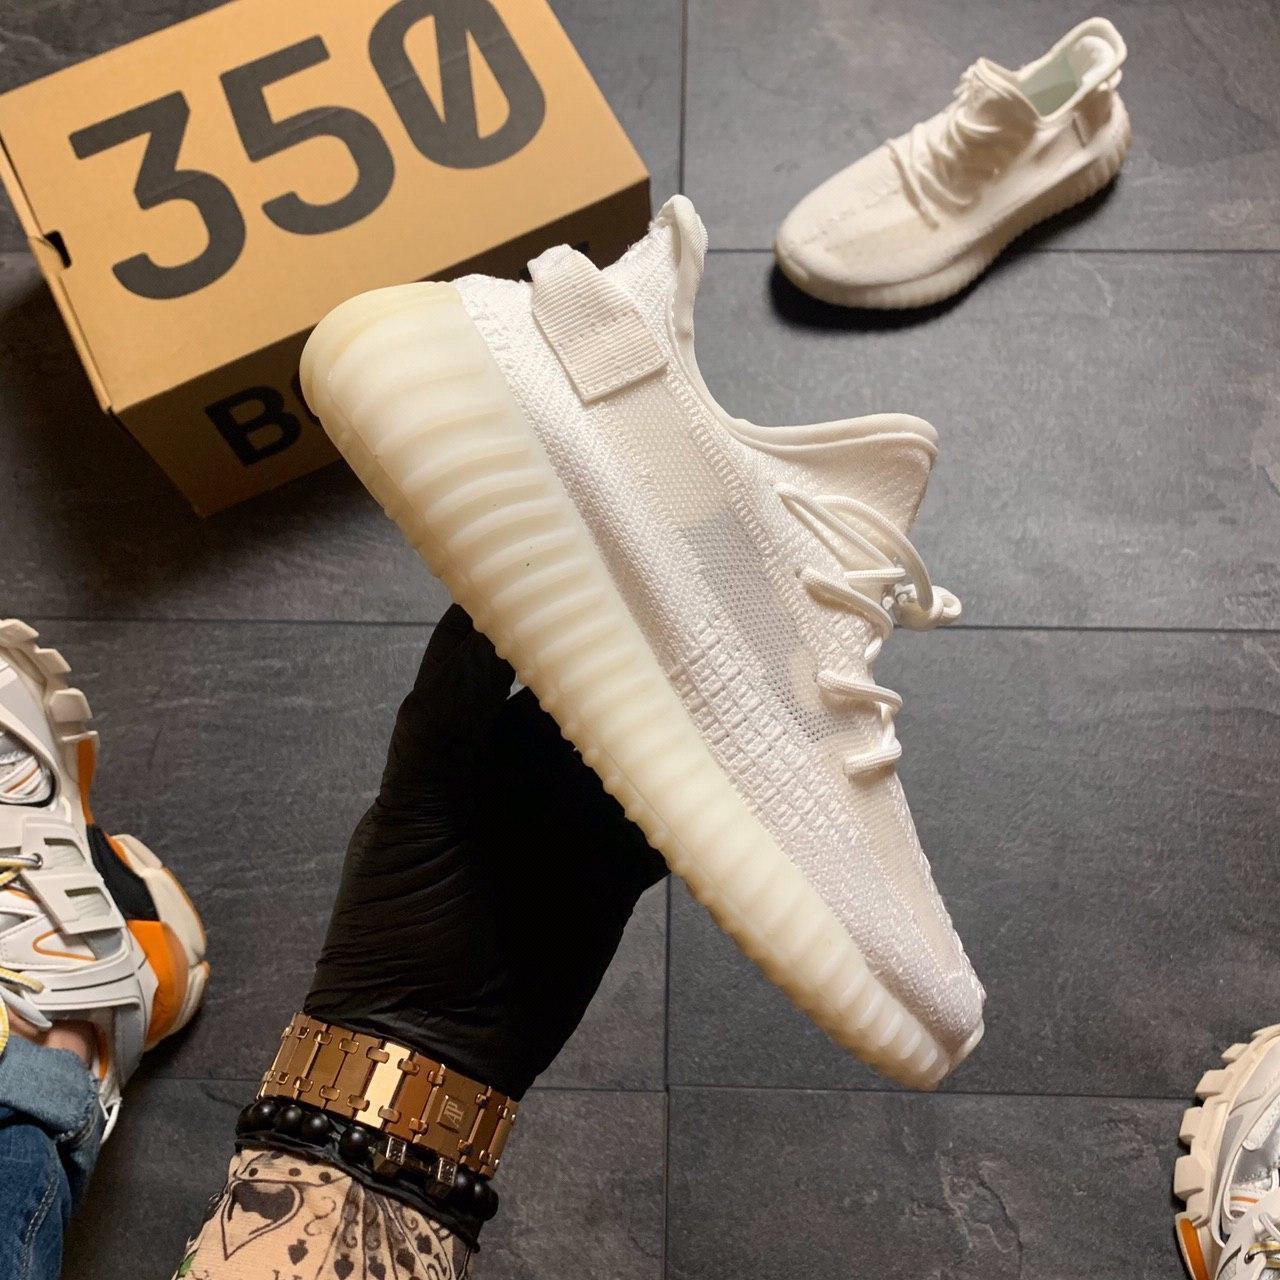 Кроссовки Adidas Yeezy Boost 350 V2 Адидас Изи Буст В2 full white Белые 🔥 Адидас мужские кроссовки 🔥